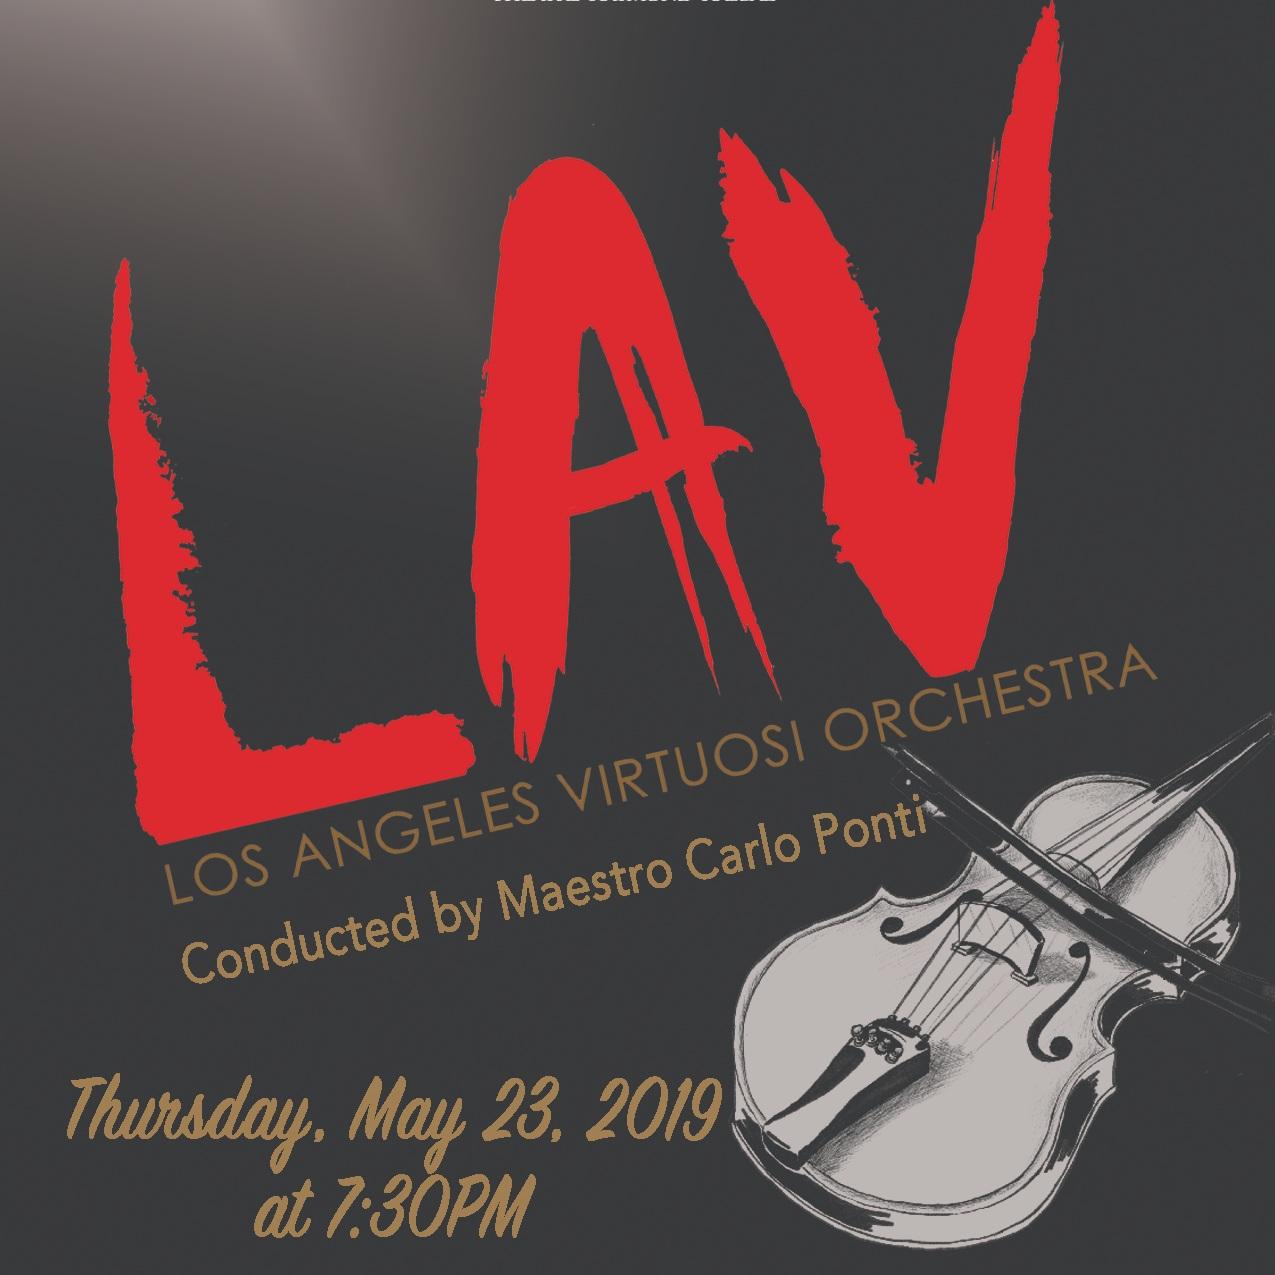 Carlo Ponti & The Los Angeles Virtuosi Orchestra